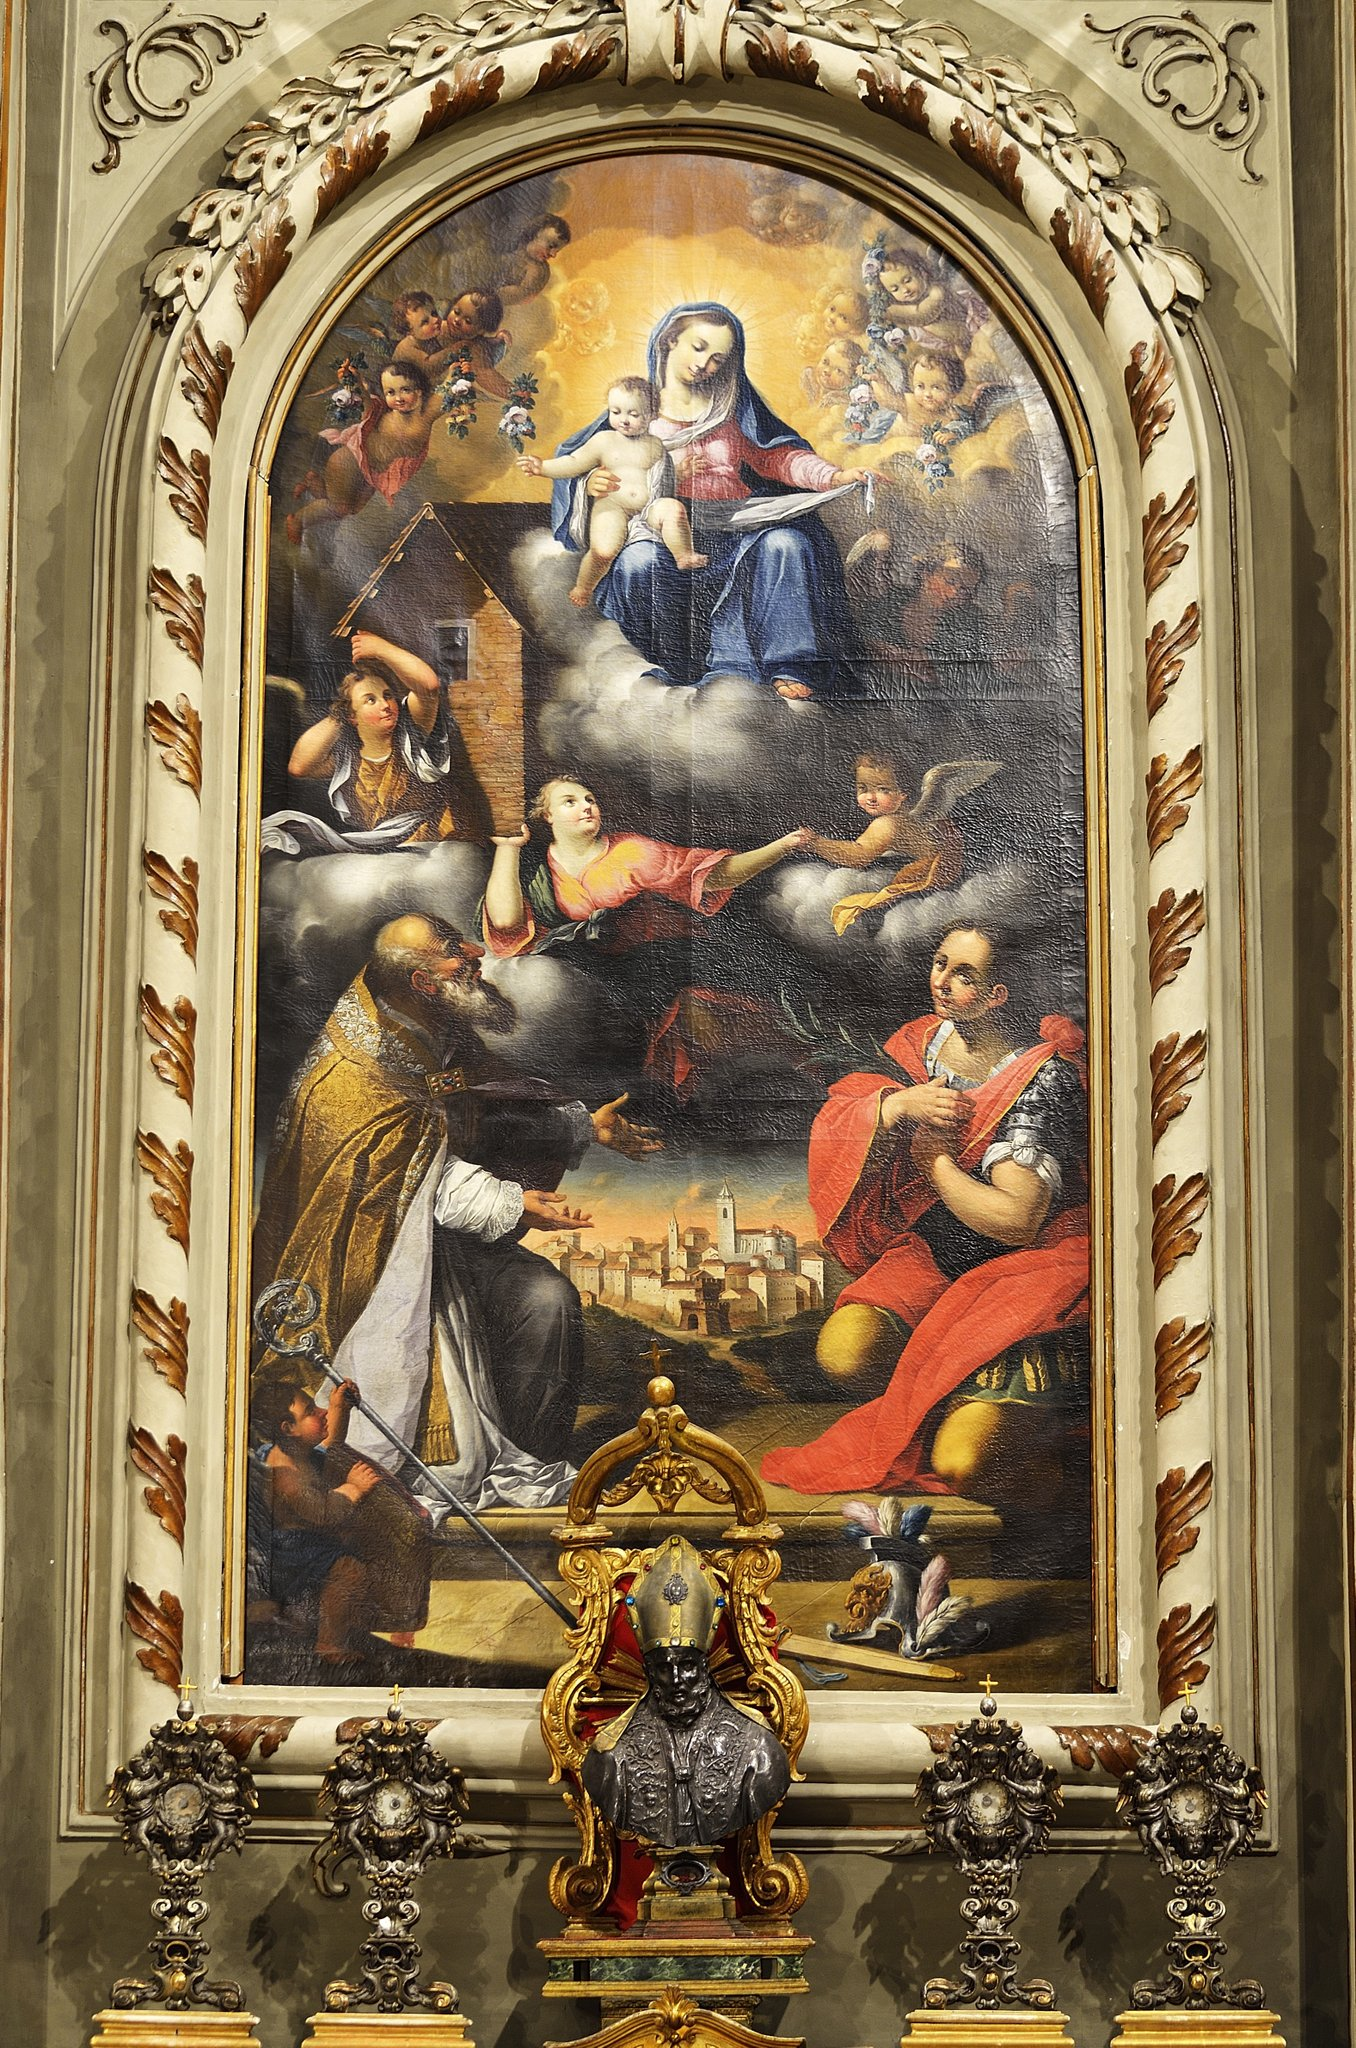 Il paes fra i Santi Giusto e Tossano